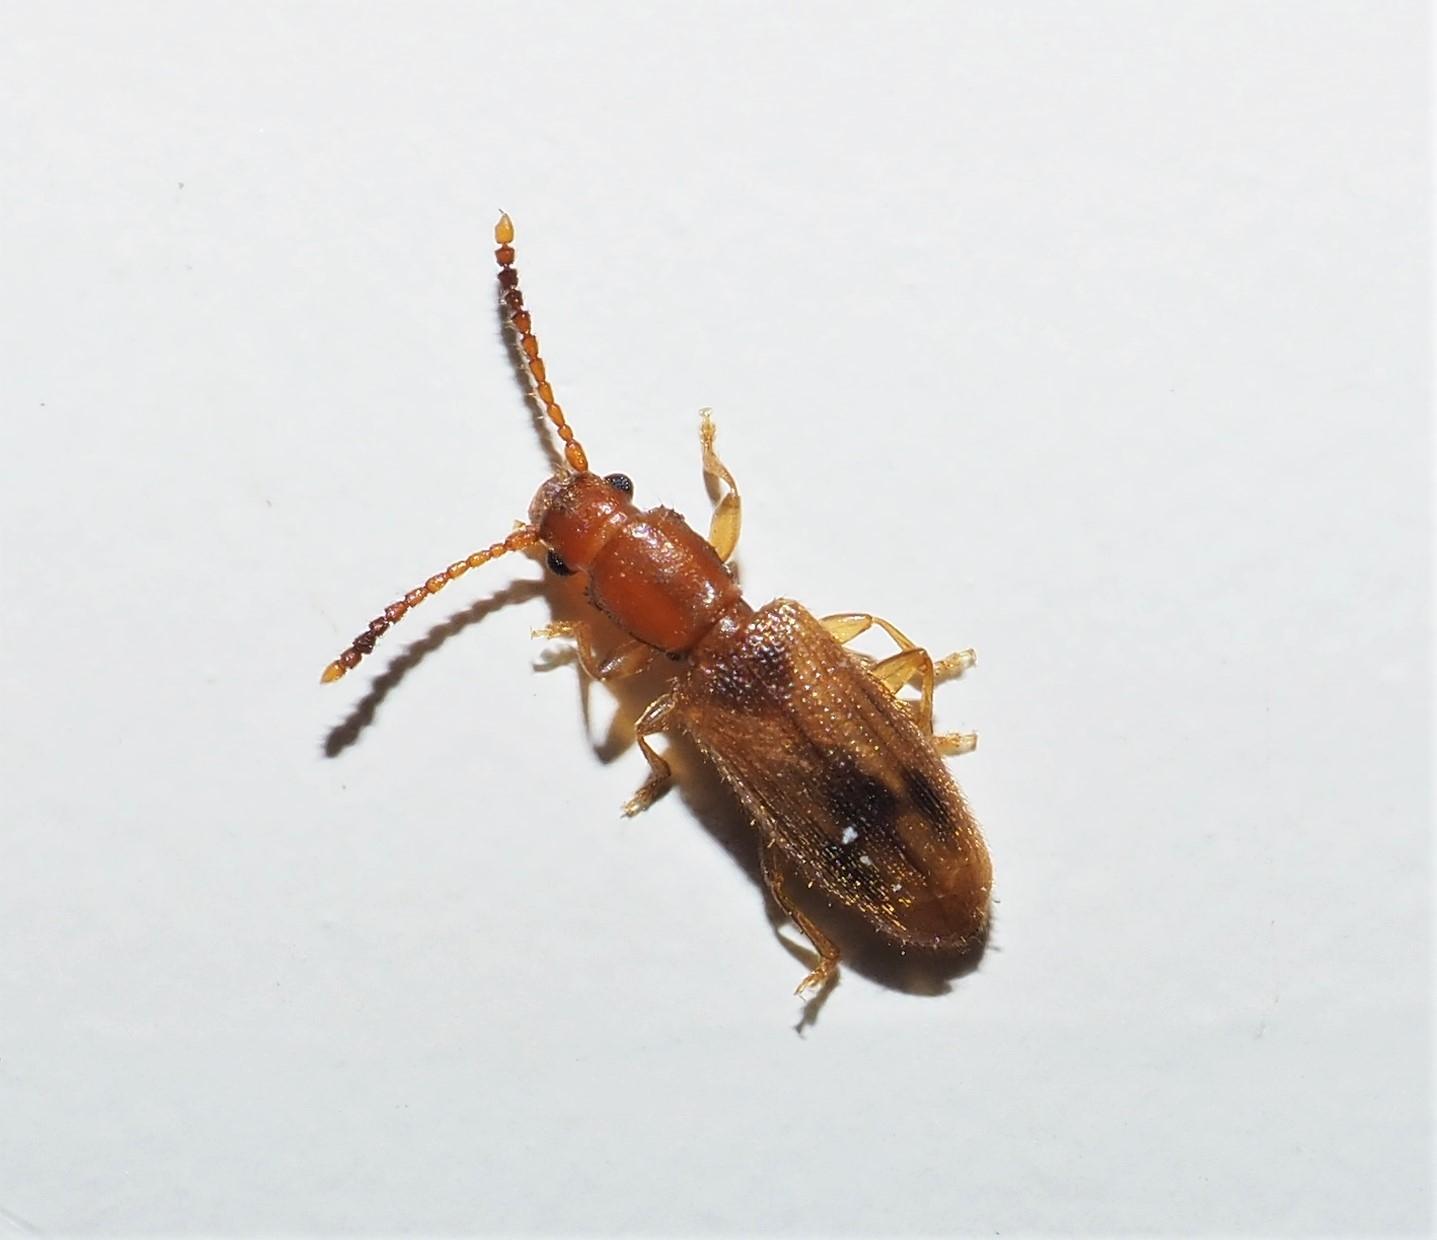 Cryptamorpha desjardinis (Cryptamorpha desjardinis)